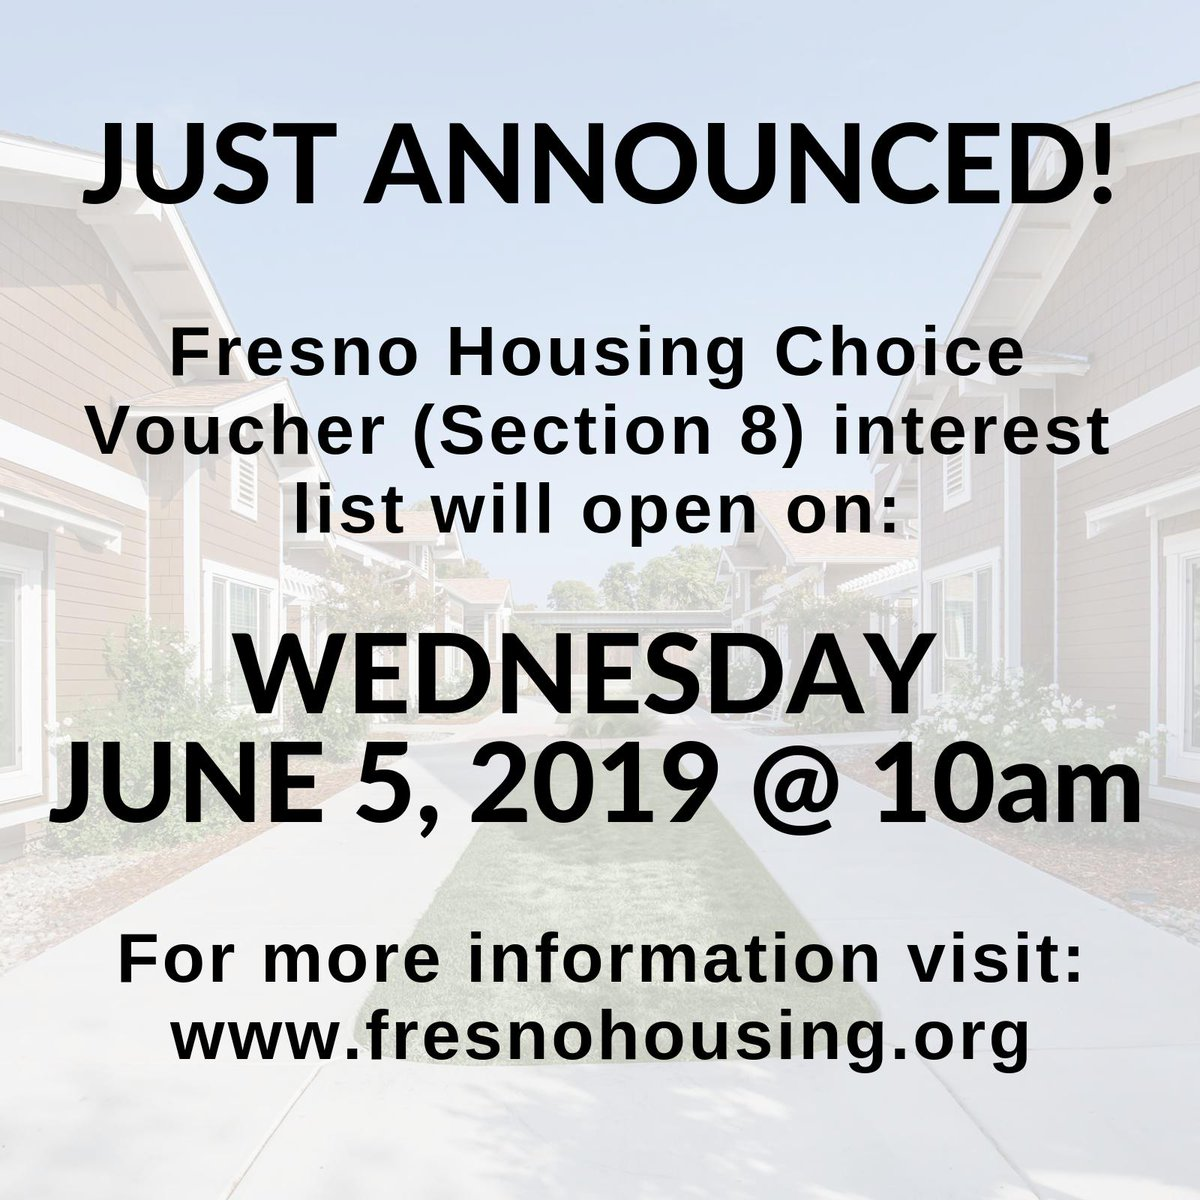 Fresno Housing Authority (@FresnoHousing) | Twitter